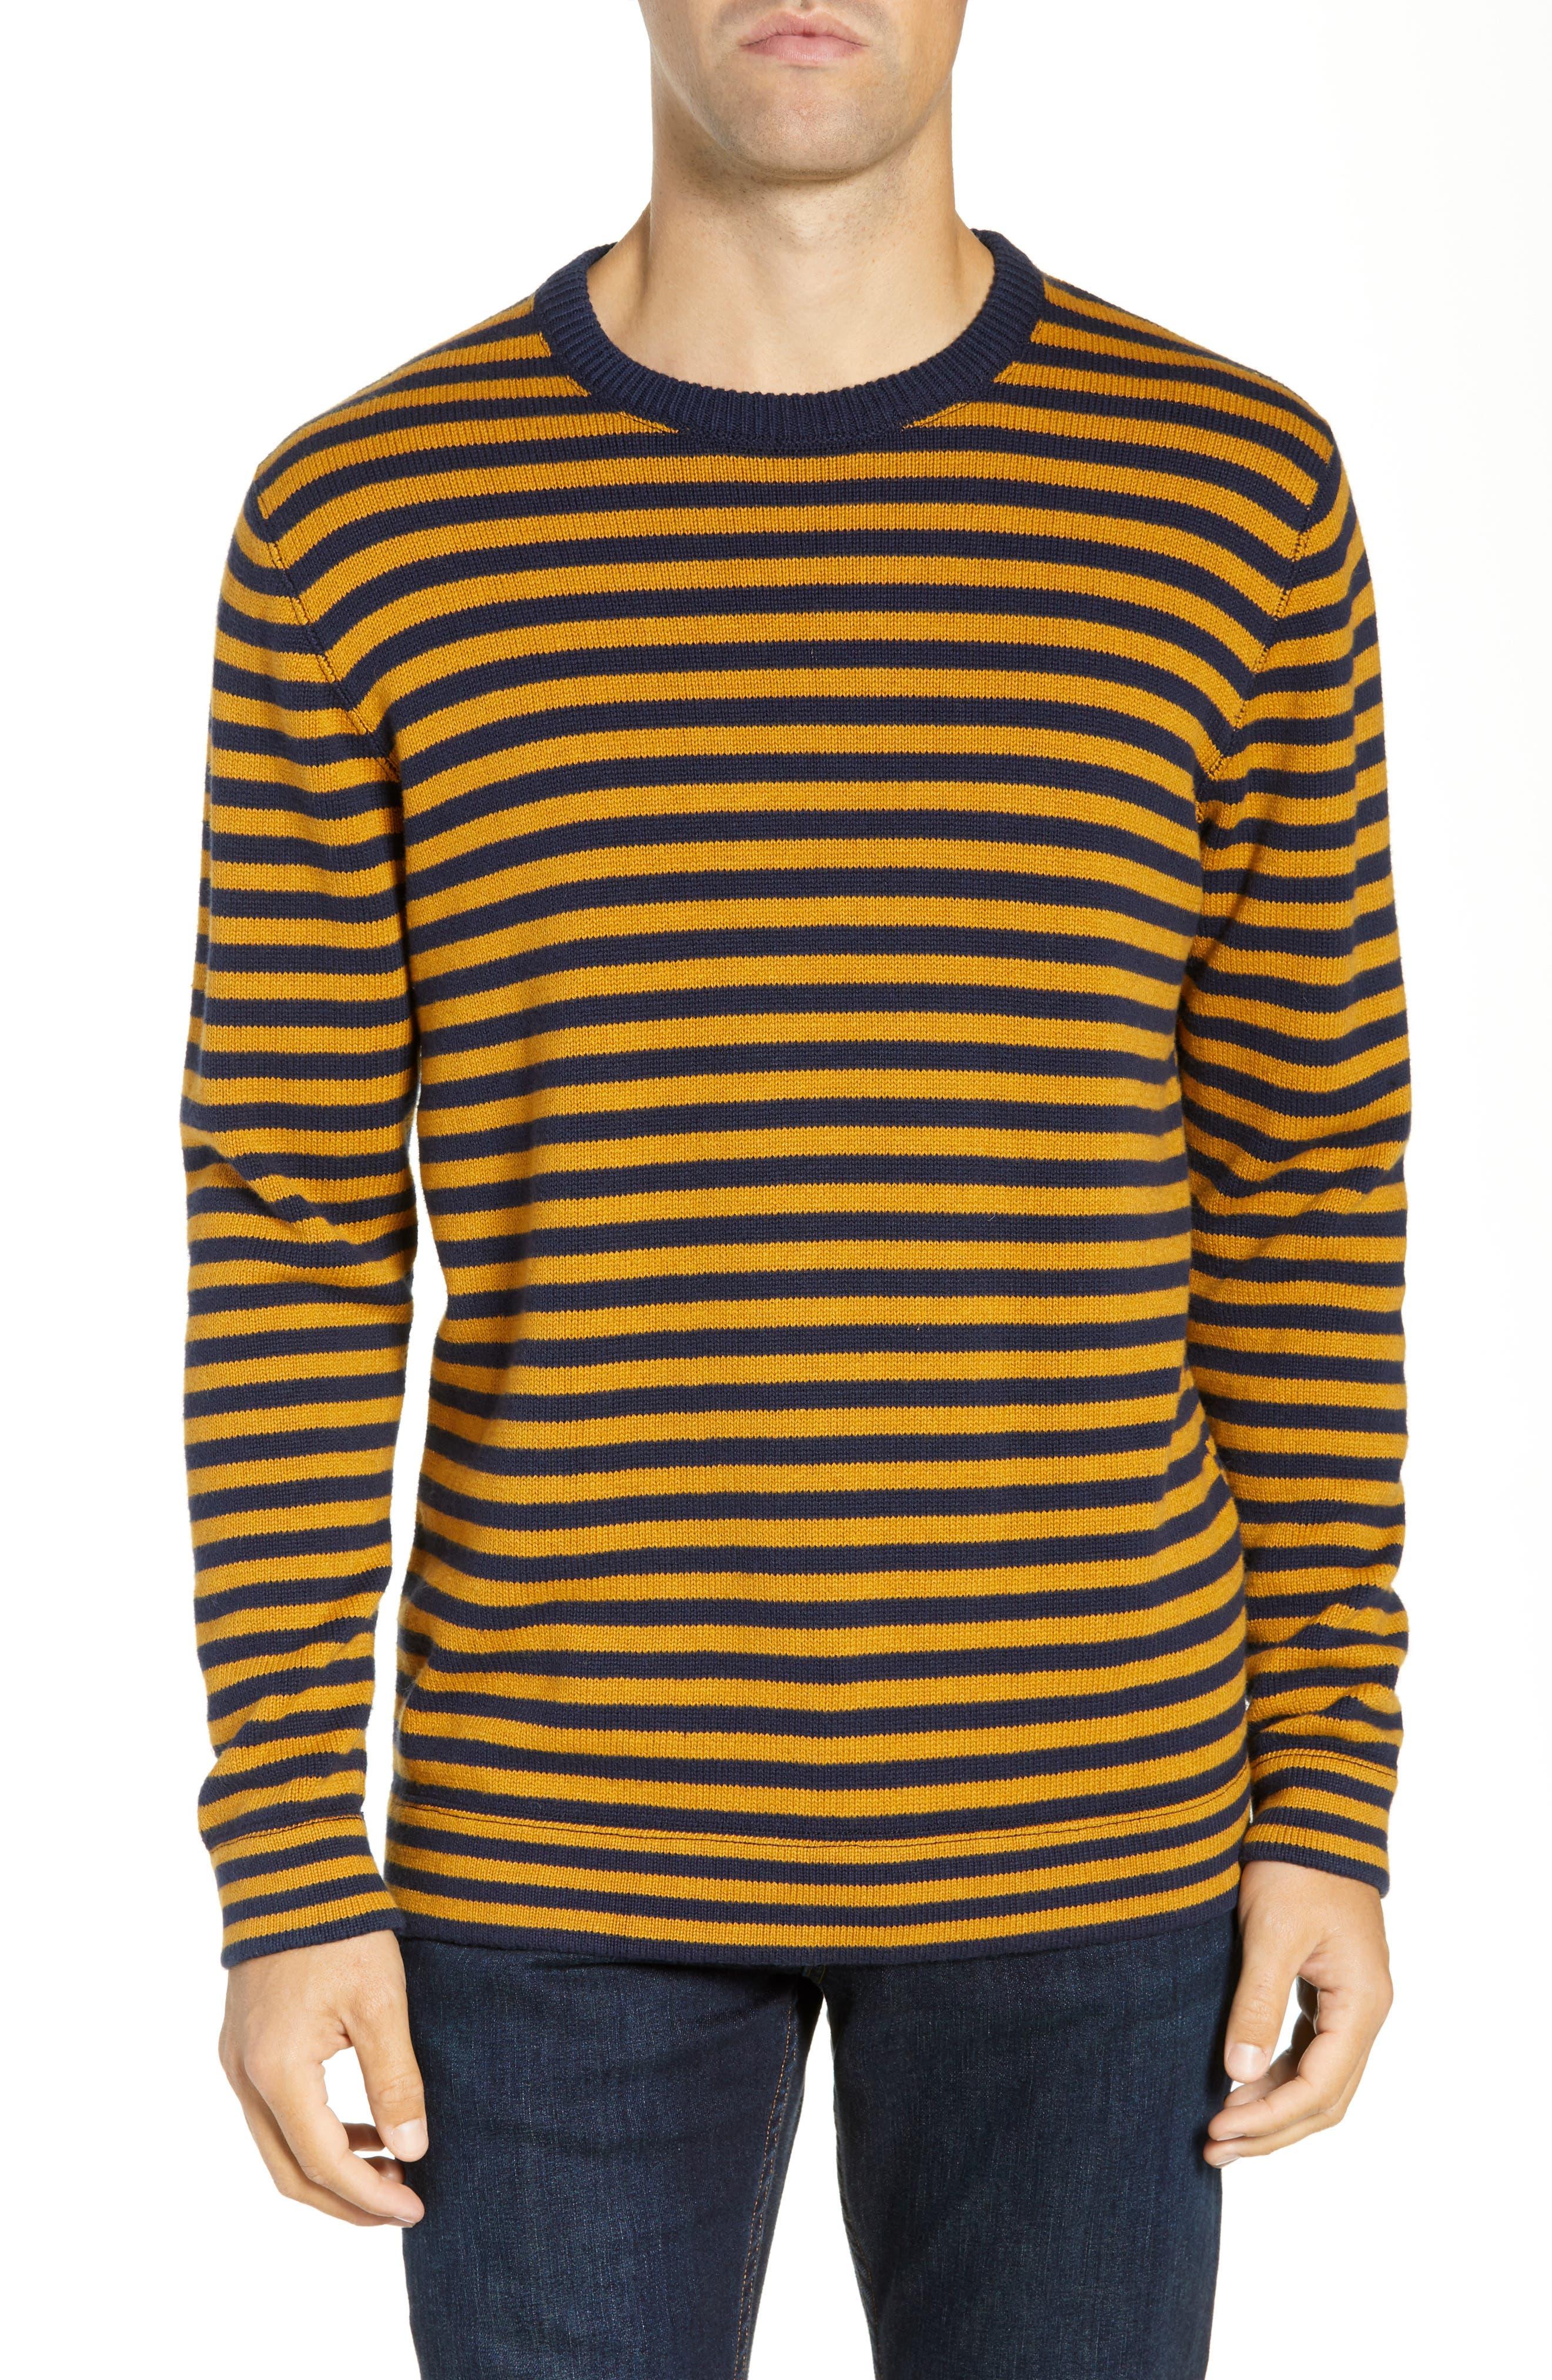 Stripe Cotton & Wool Sweater,                             Main thumbnail 1, color,                             CALLUNA YELLOW UTILITY BLUE